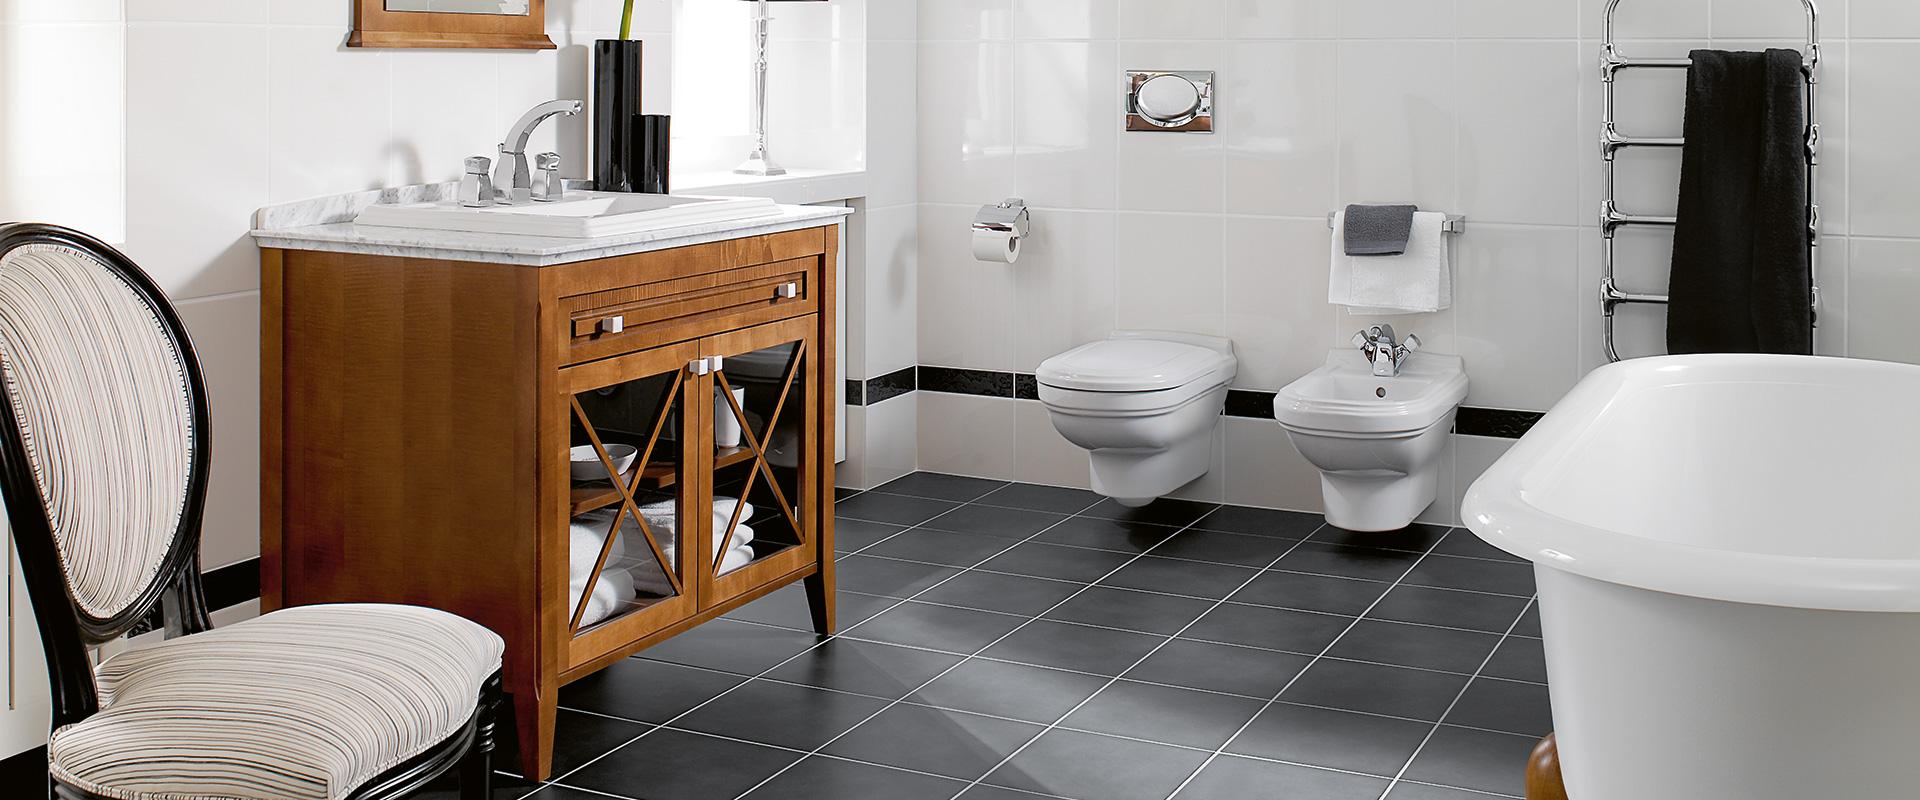 Hommage collection pour salle de bains en relief - Meuble de salle de bain villeroy et boch ...